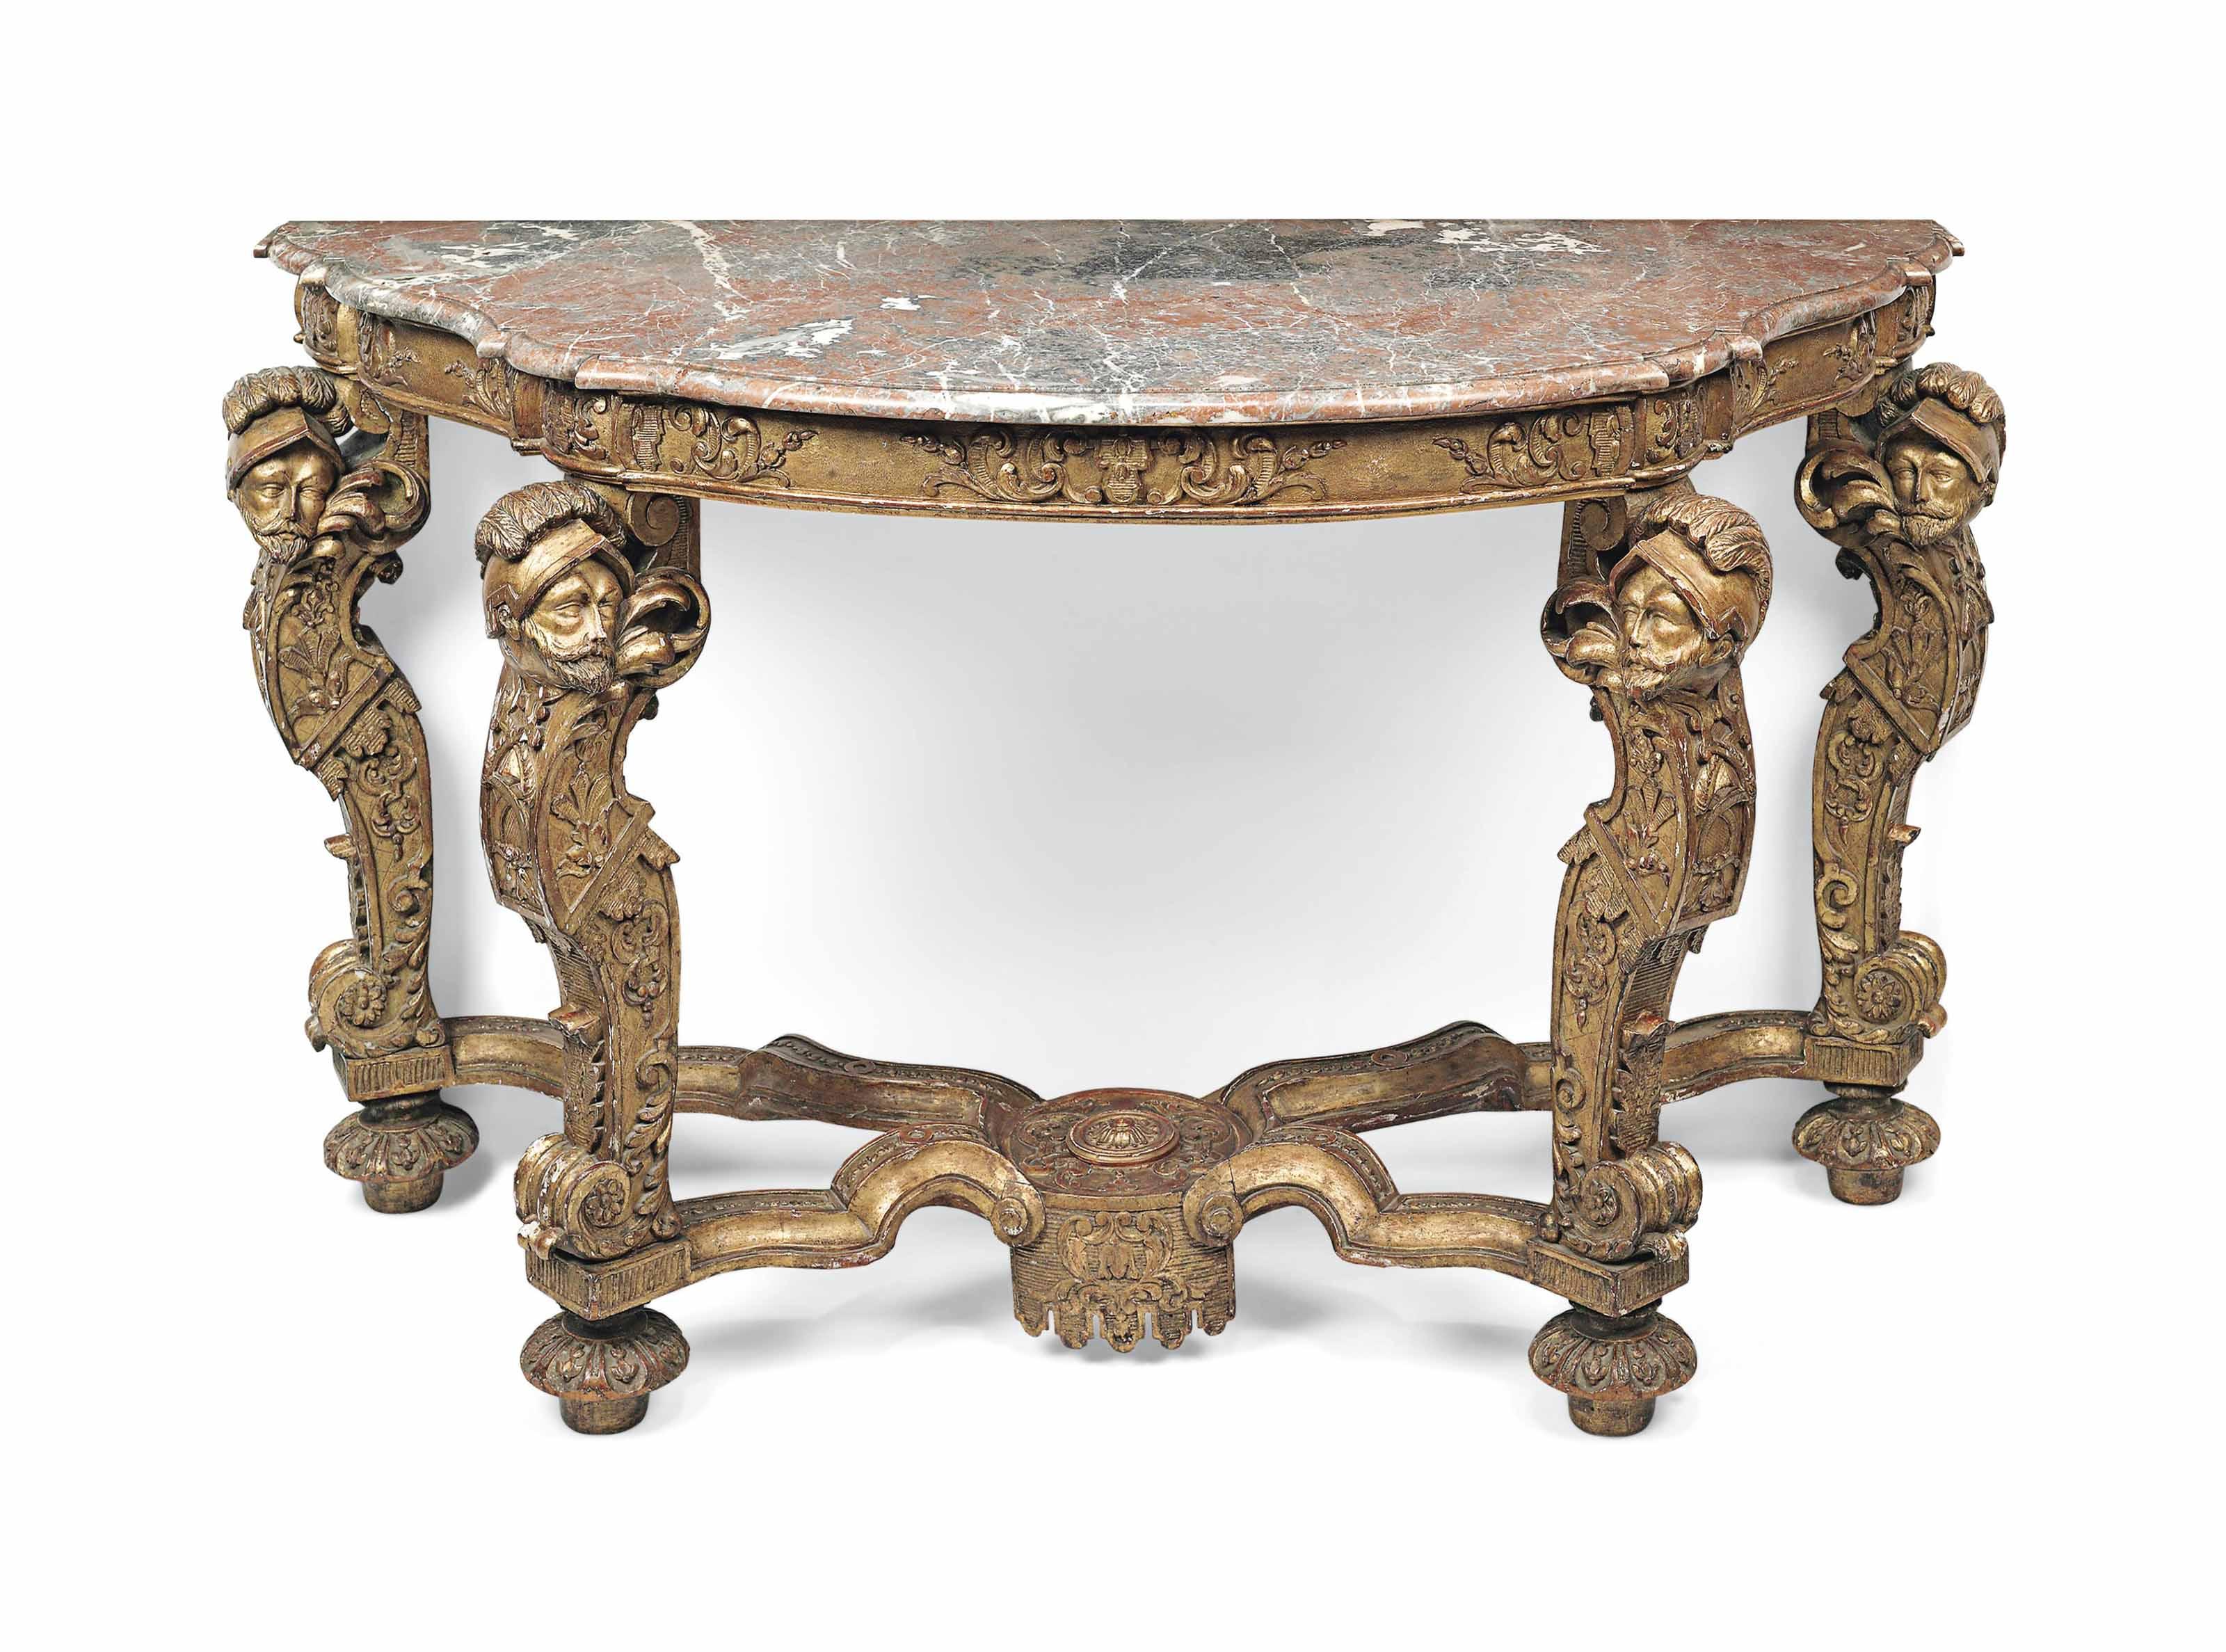 A DUTCH GILTWOOD CONSOLE TABLE